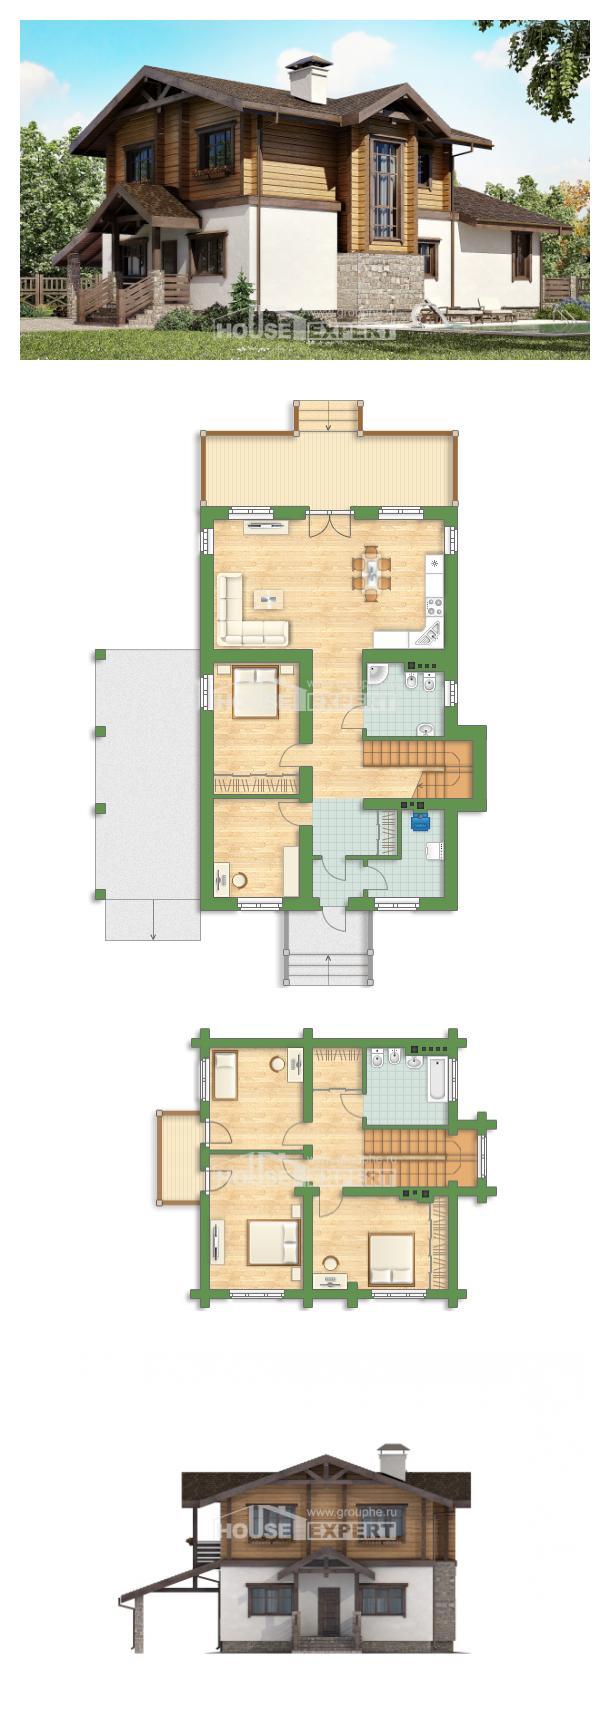 Проект дома 170-004-Л   House Expert